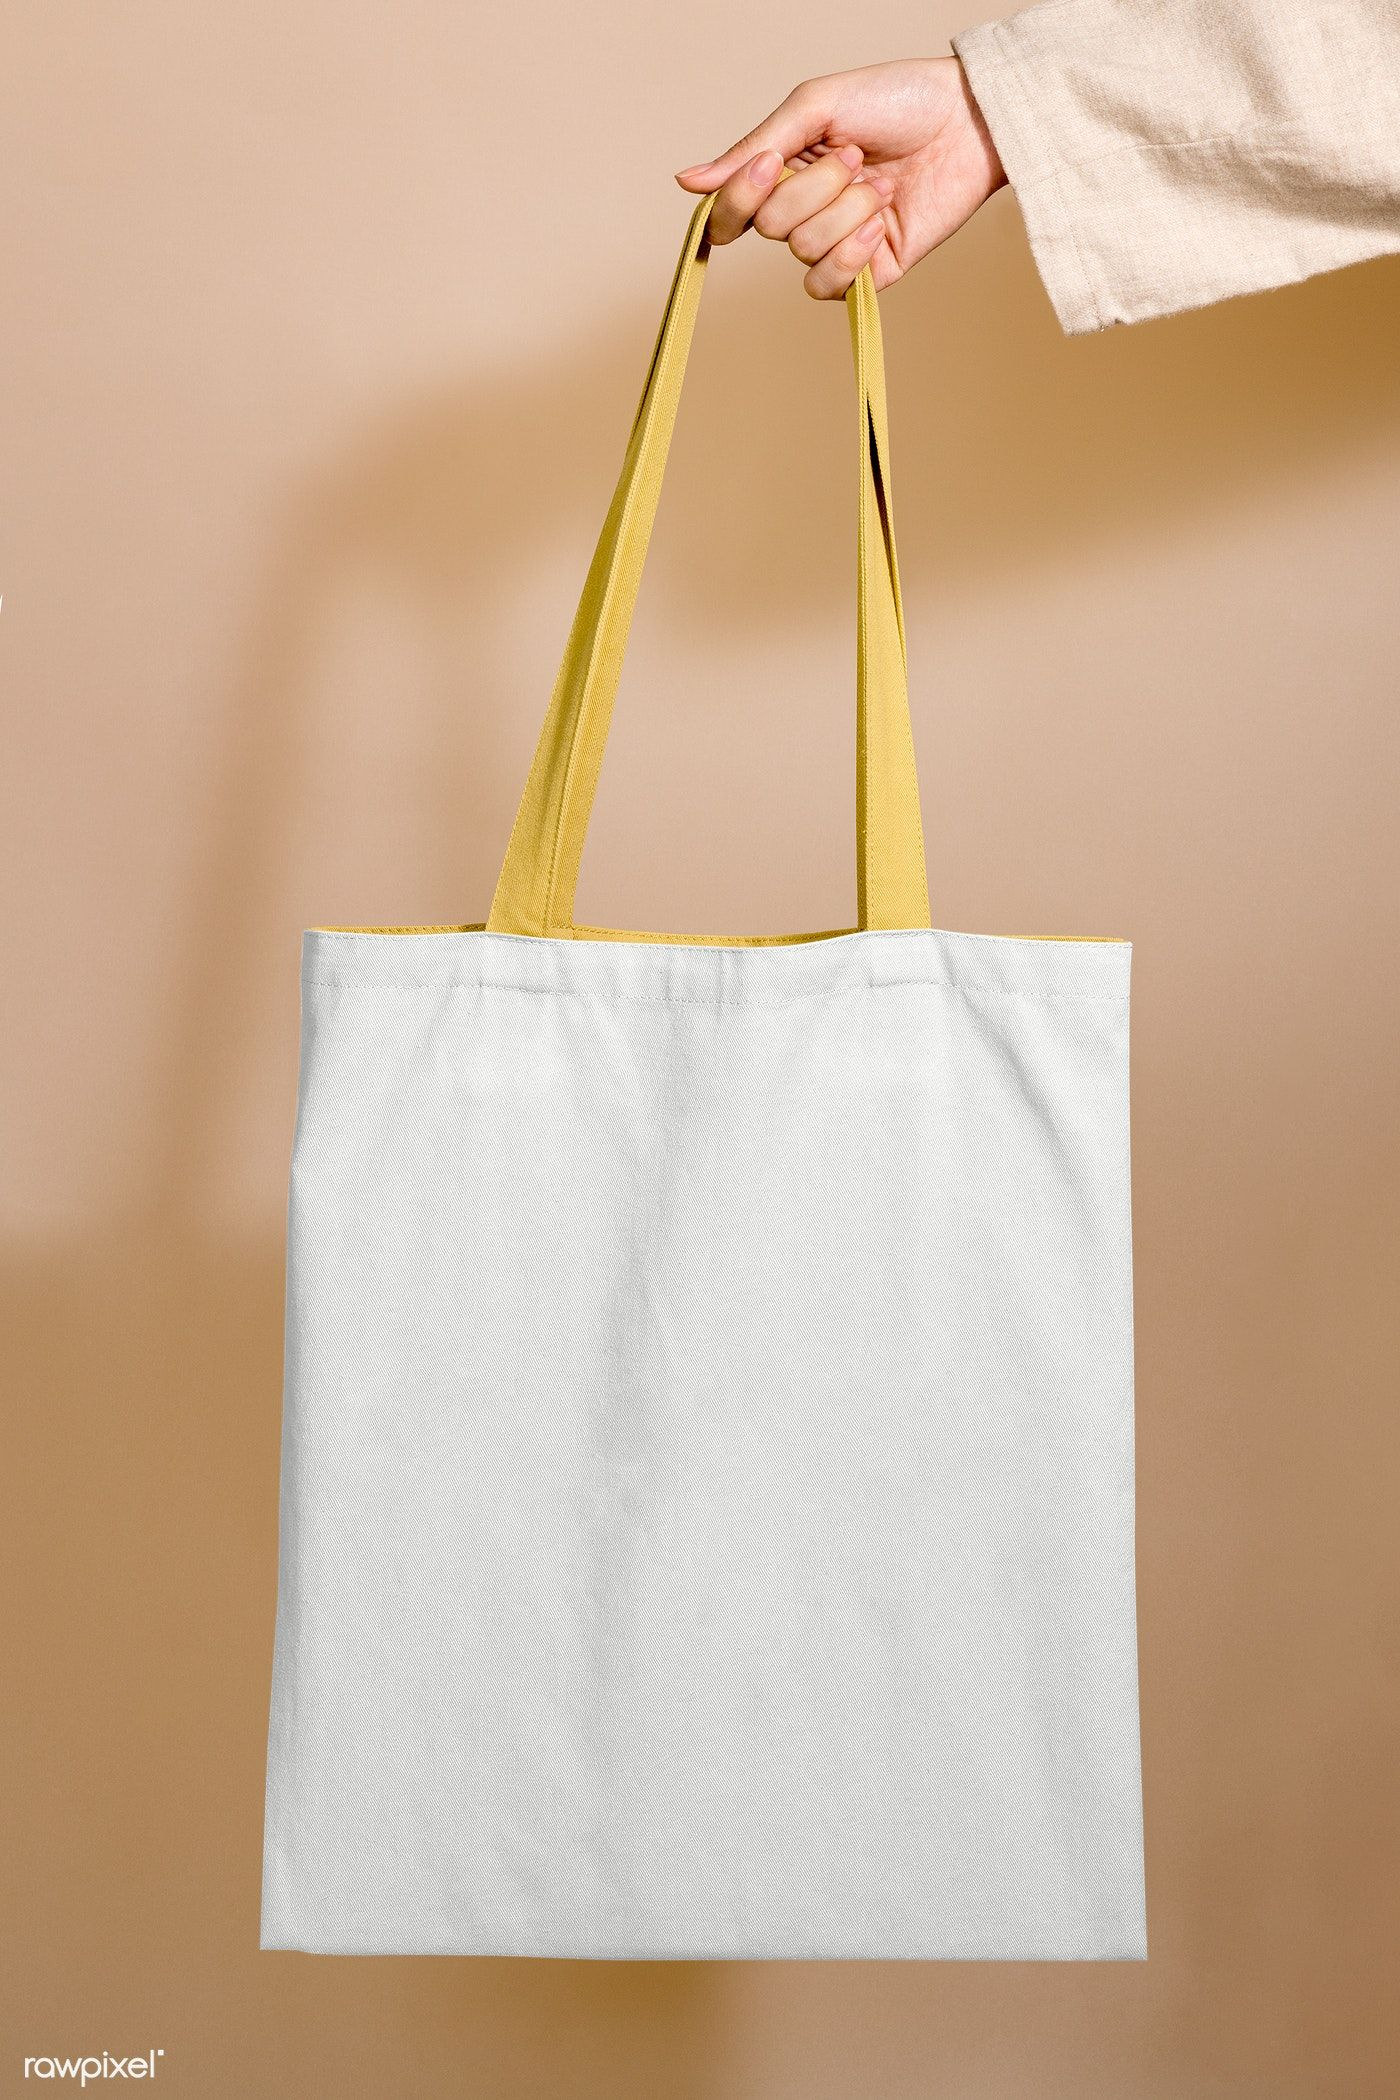 Download Woman Holding A Tote Bag Mockup In Her Hand Free Image By Rawpixel Com Jira Bag Mockup Design Mockup Free Tote Bag